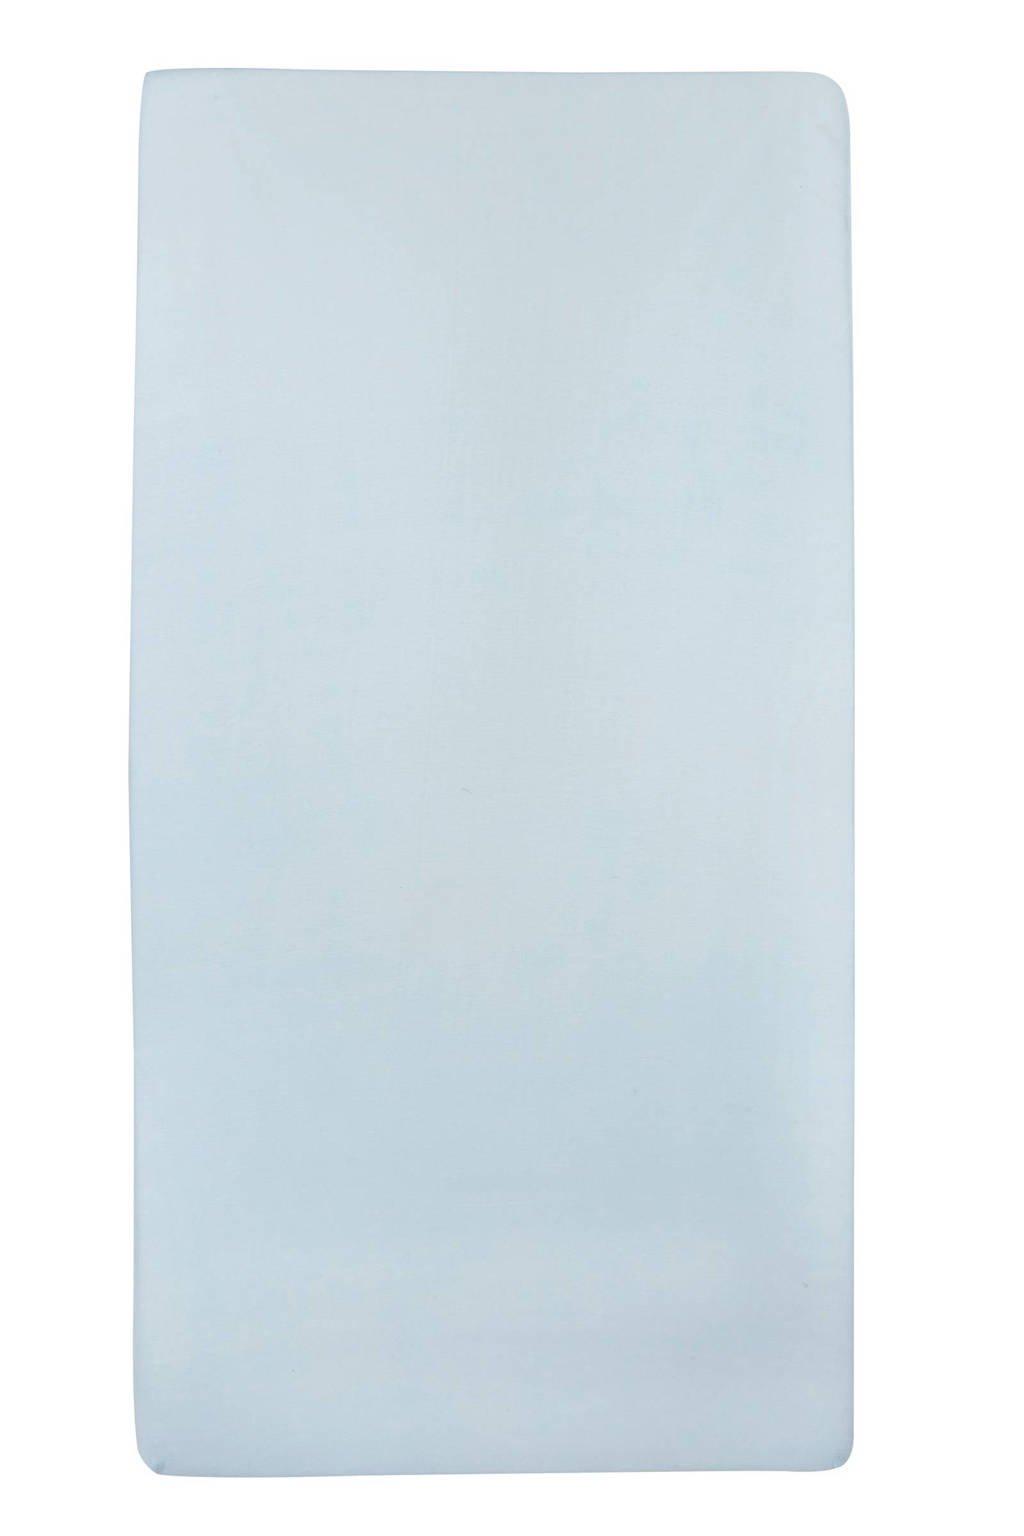 Meyco jersey hoeslaken ledikant 60x120 cm Lichtblauw